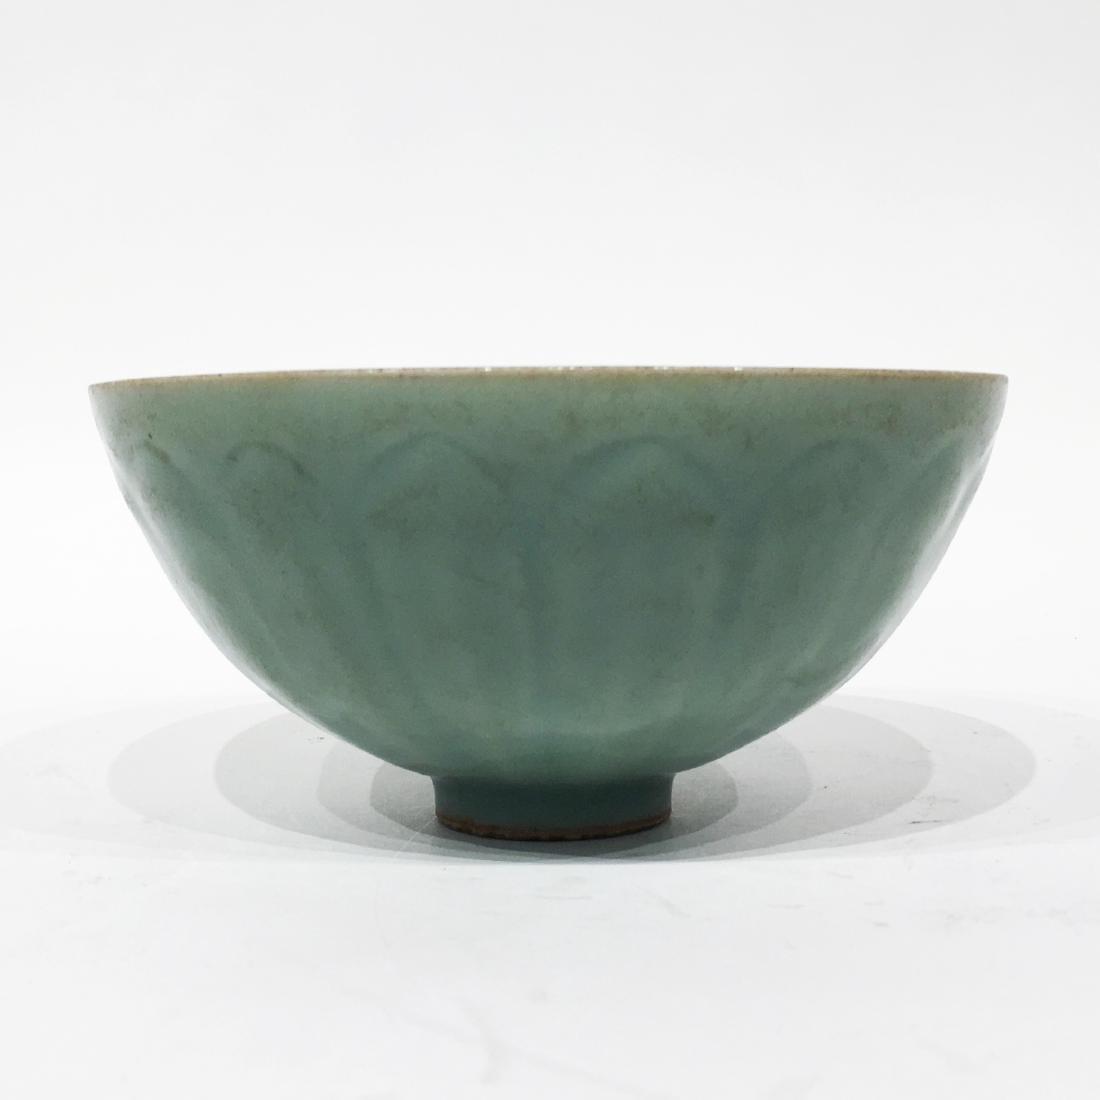 A Chinese Celadon Lung-chuan Bowl